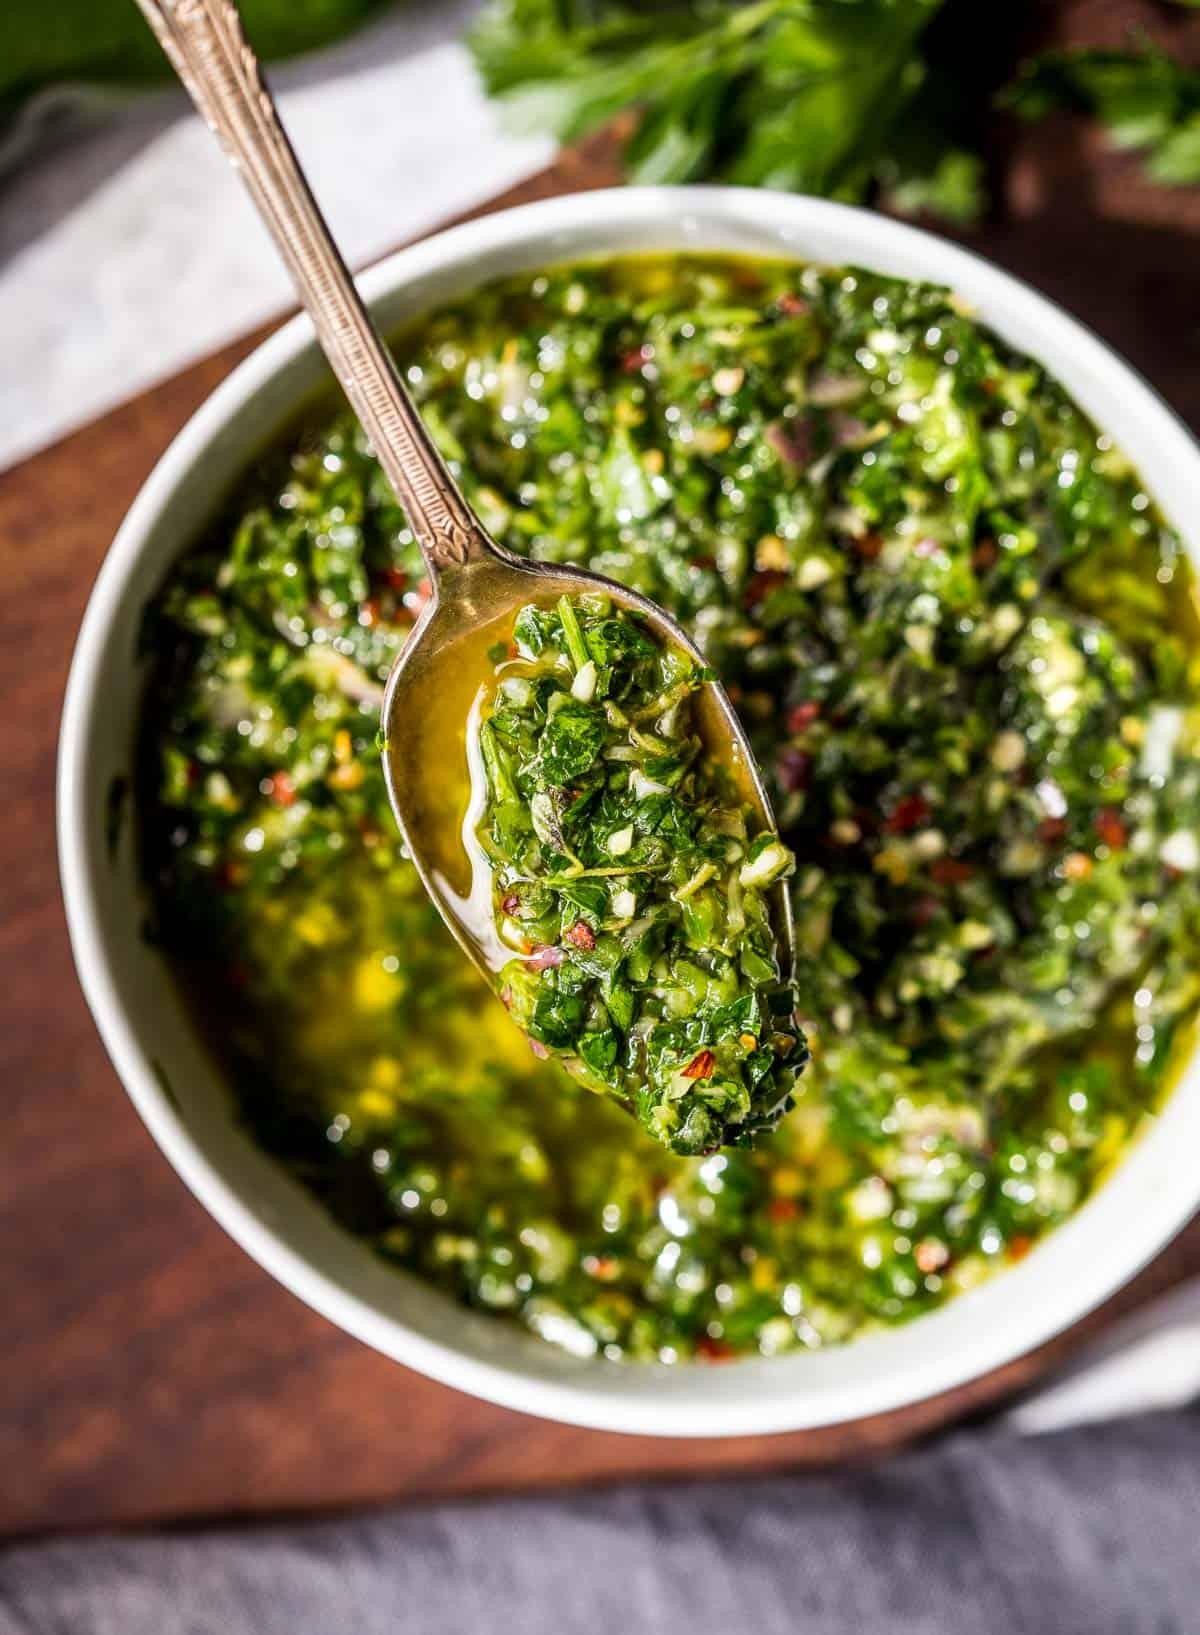 A spoonful of Jalapeño Chimichurri sauce